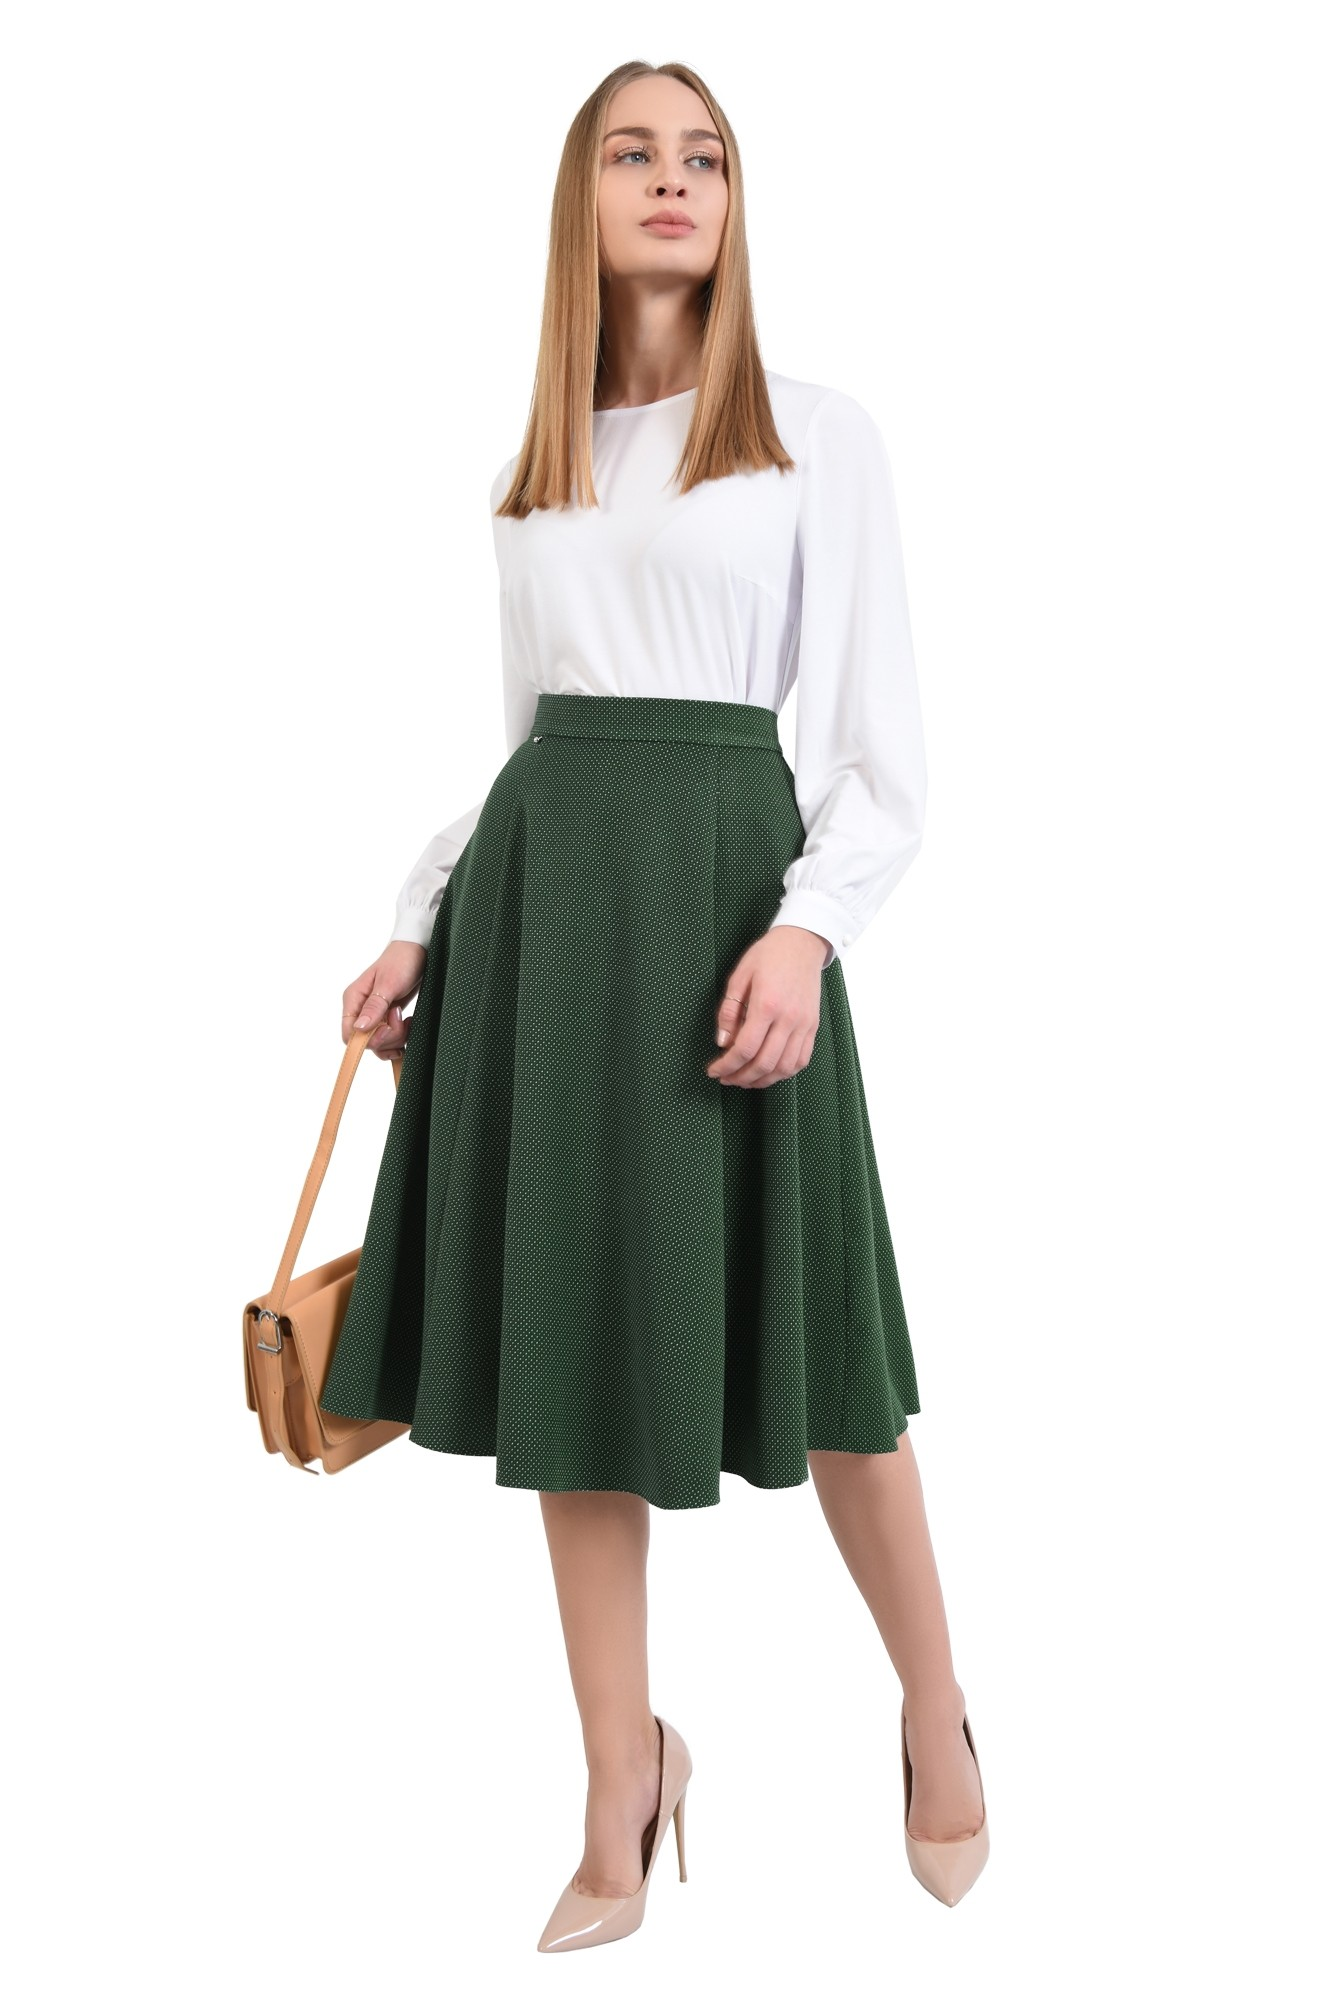 0 - fusta de zi, evazata, verde, cu picouri albe, cu talie inalta